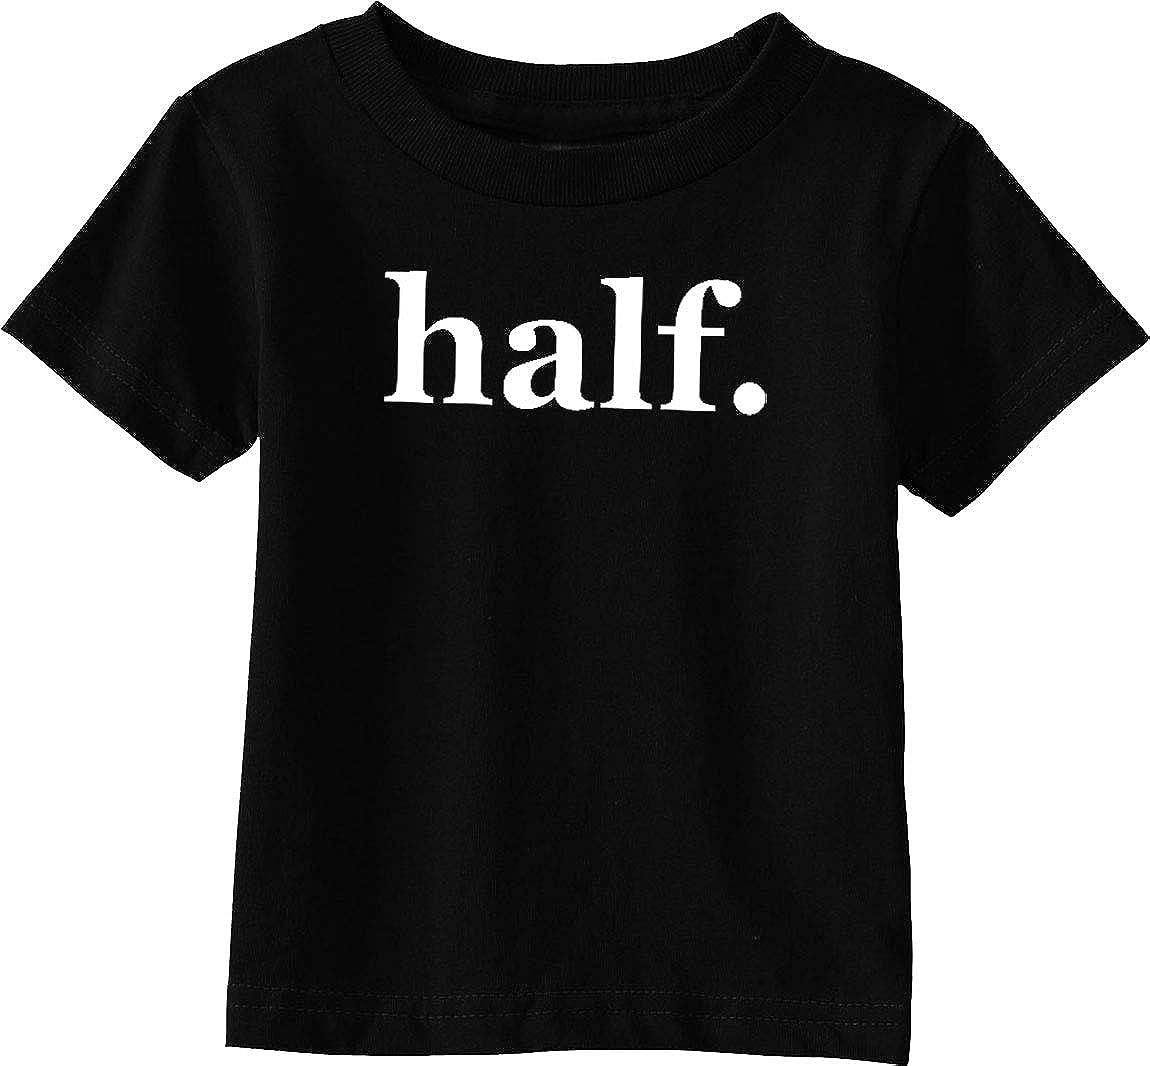 Custom Kingdom sale Baby Half. 6 Months for Old Half Shirt Birthday B Sale Special Price